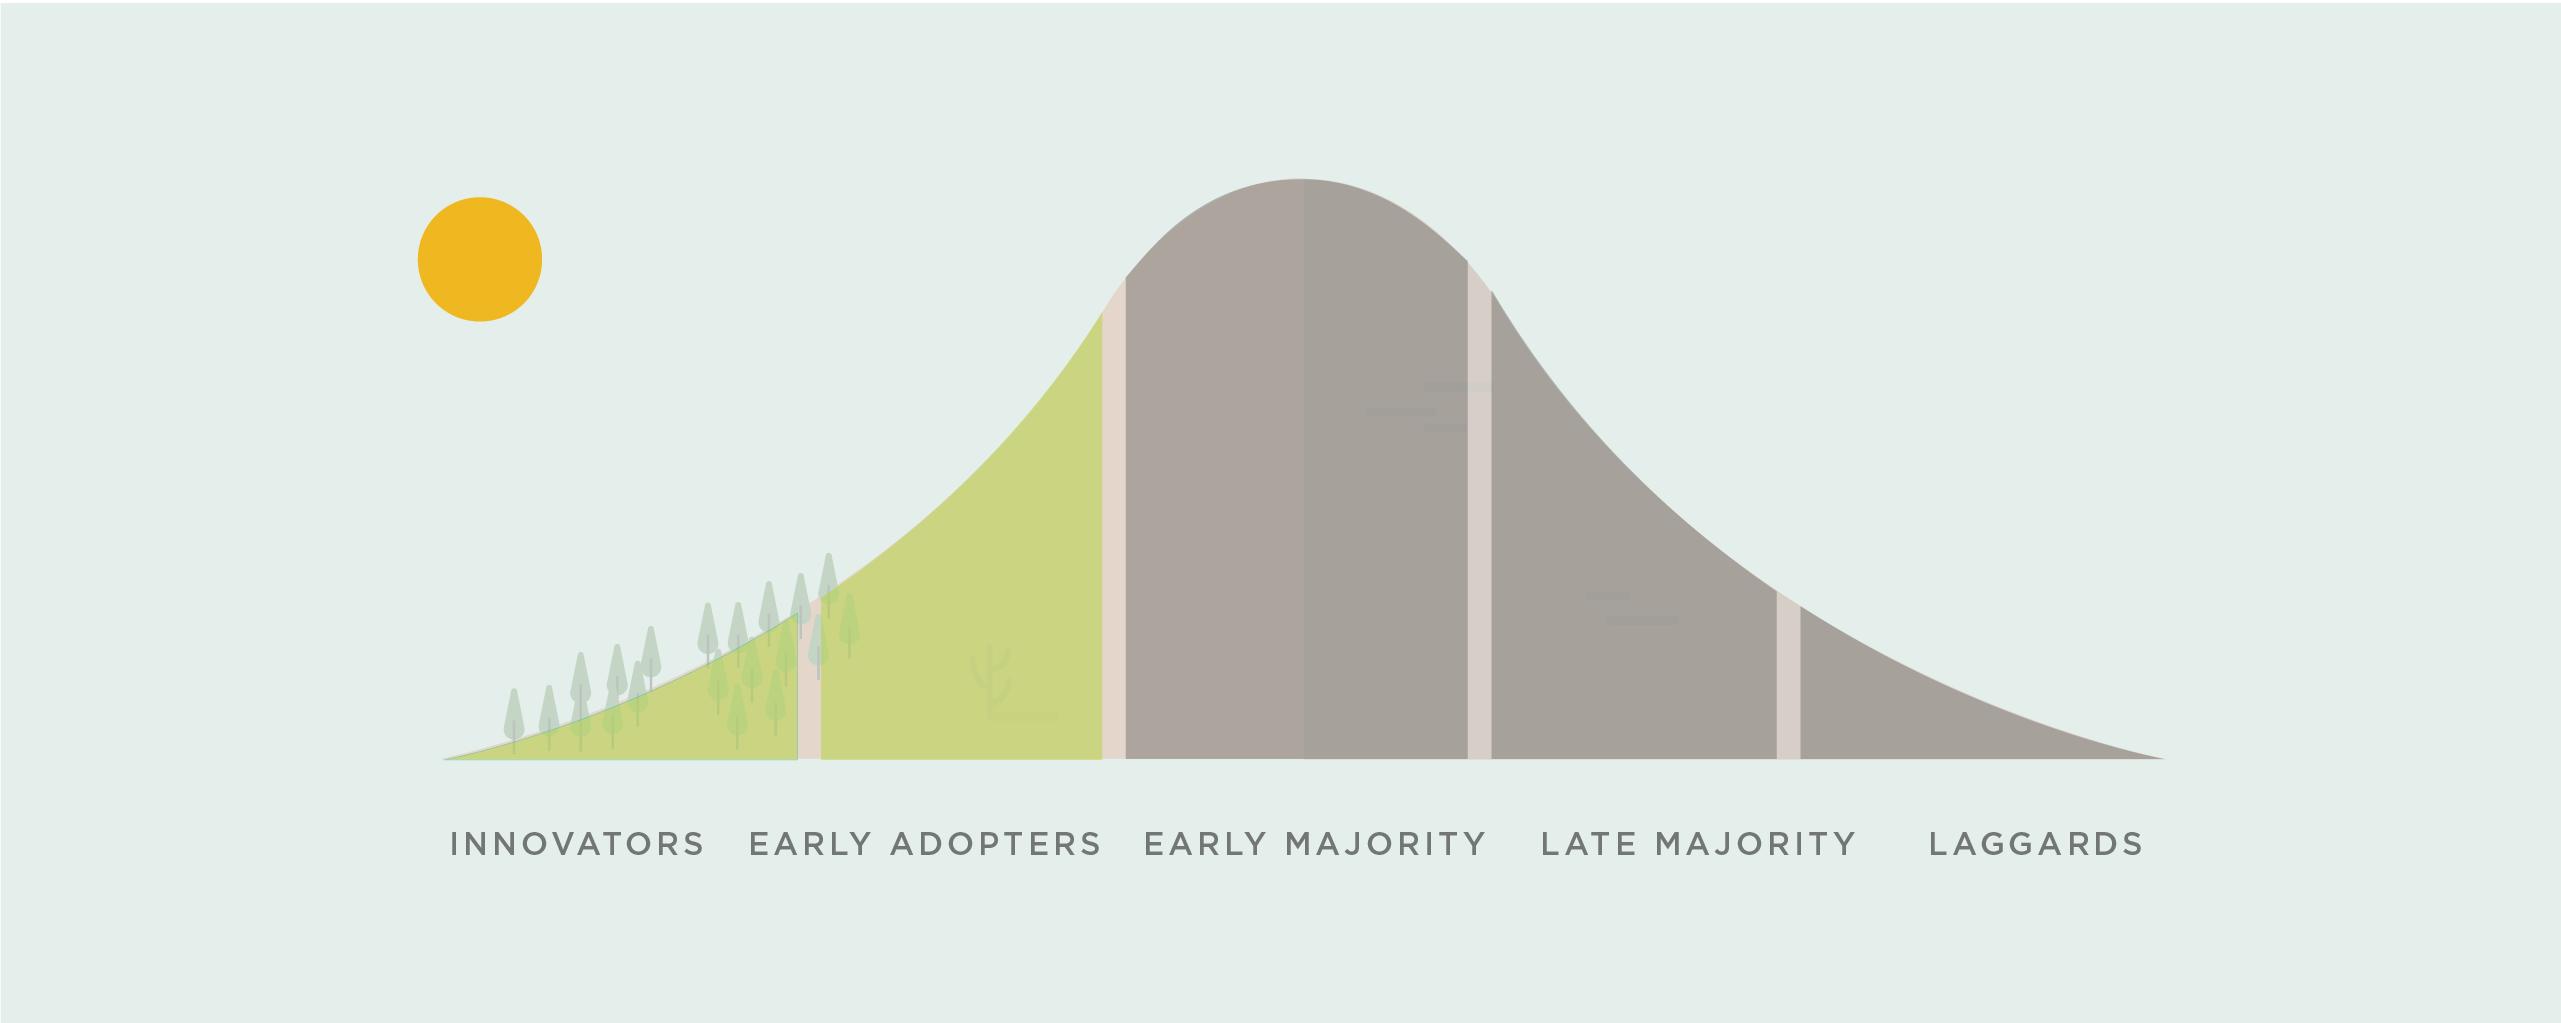 timeline of technology adoption